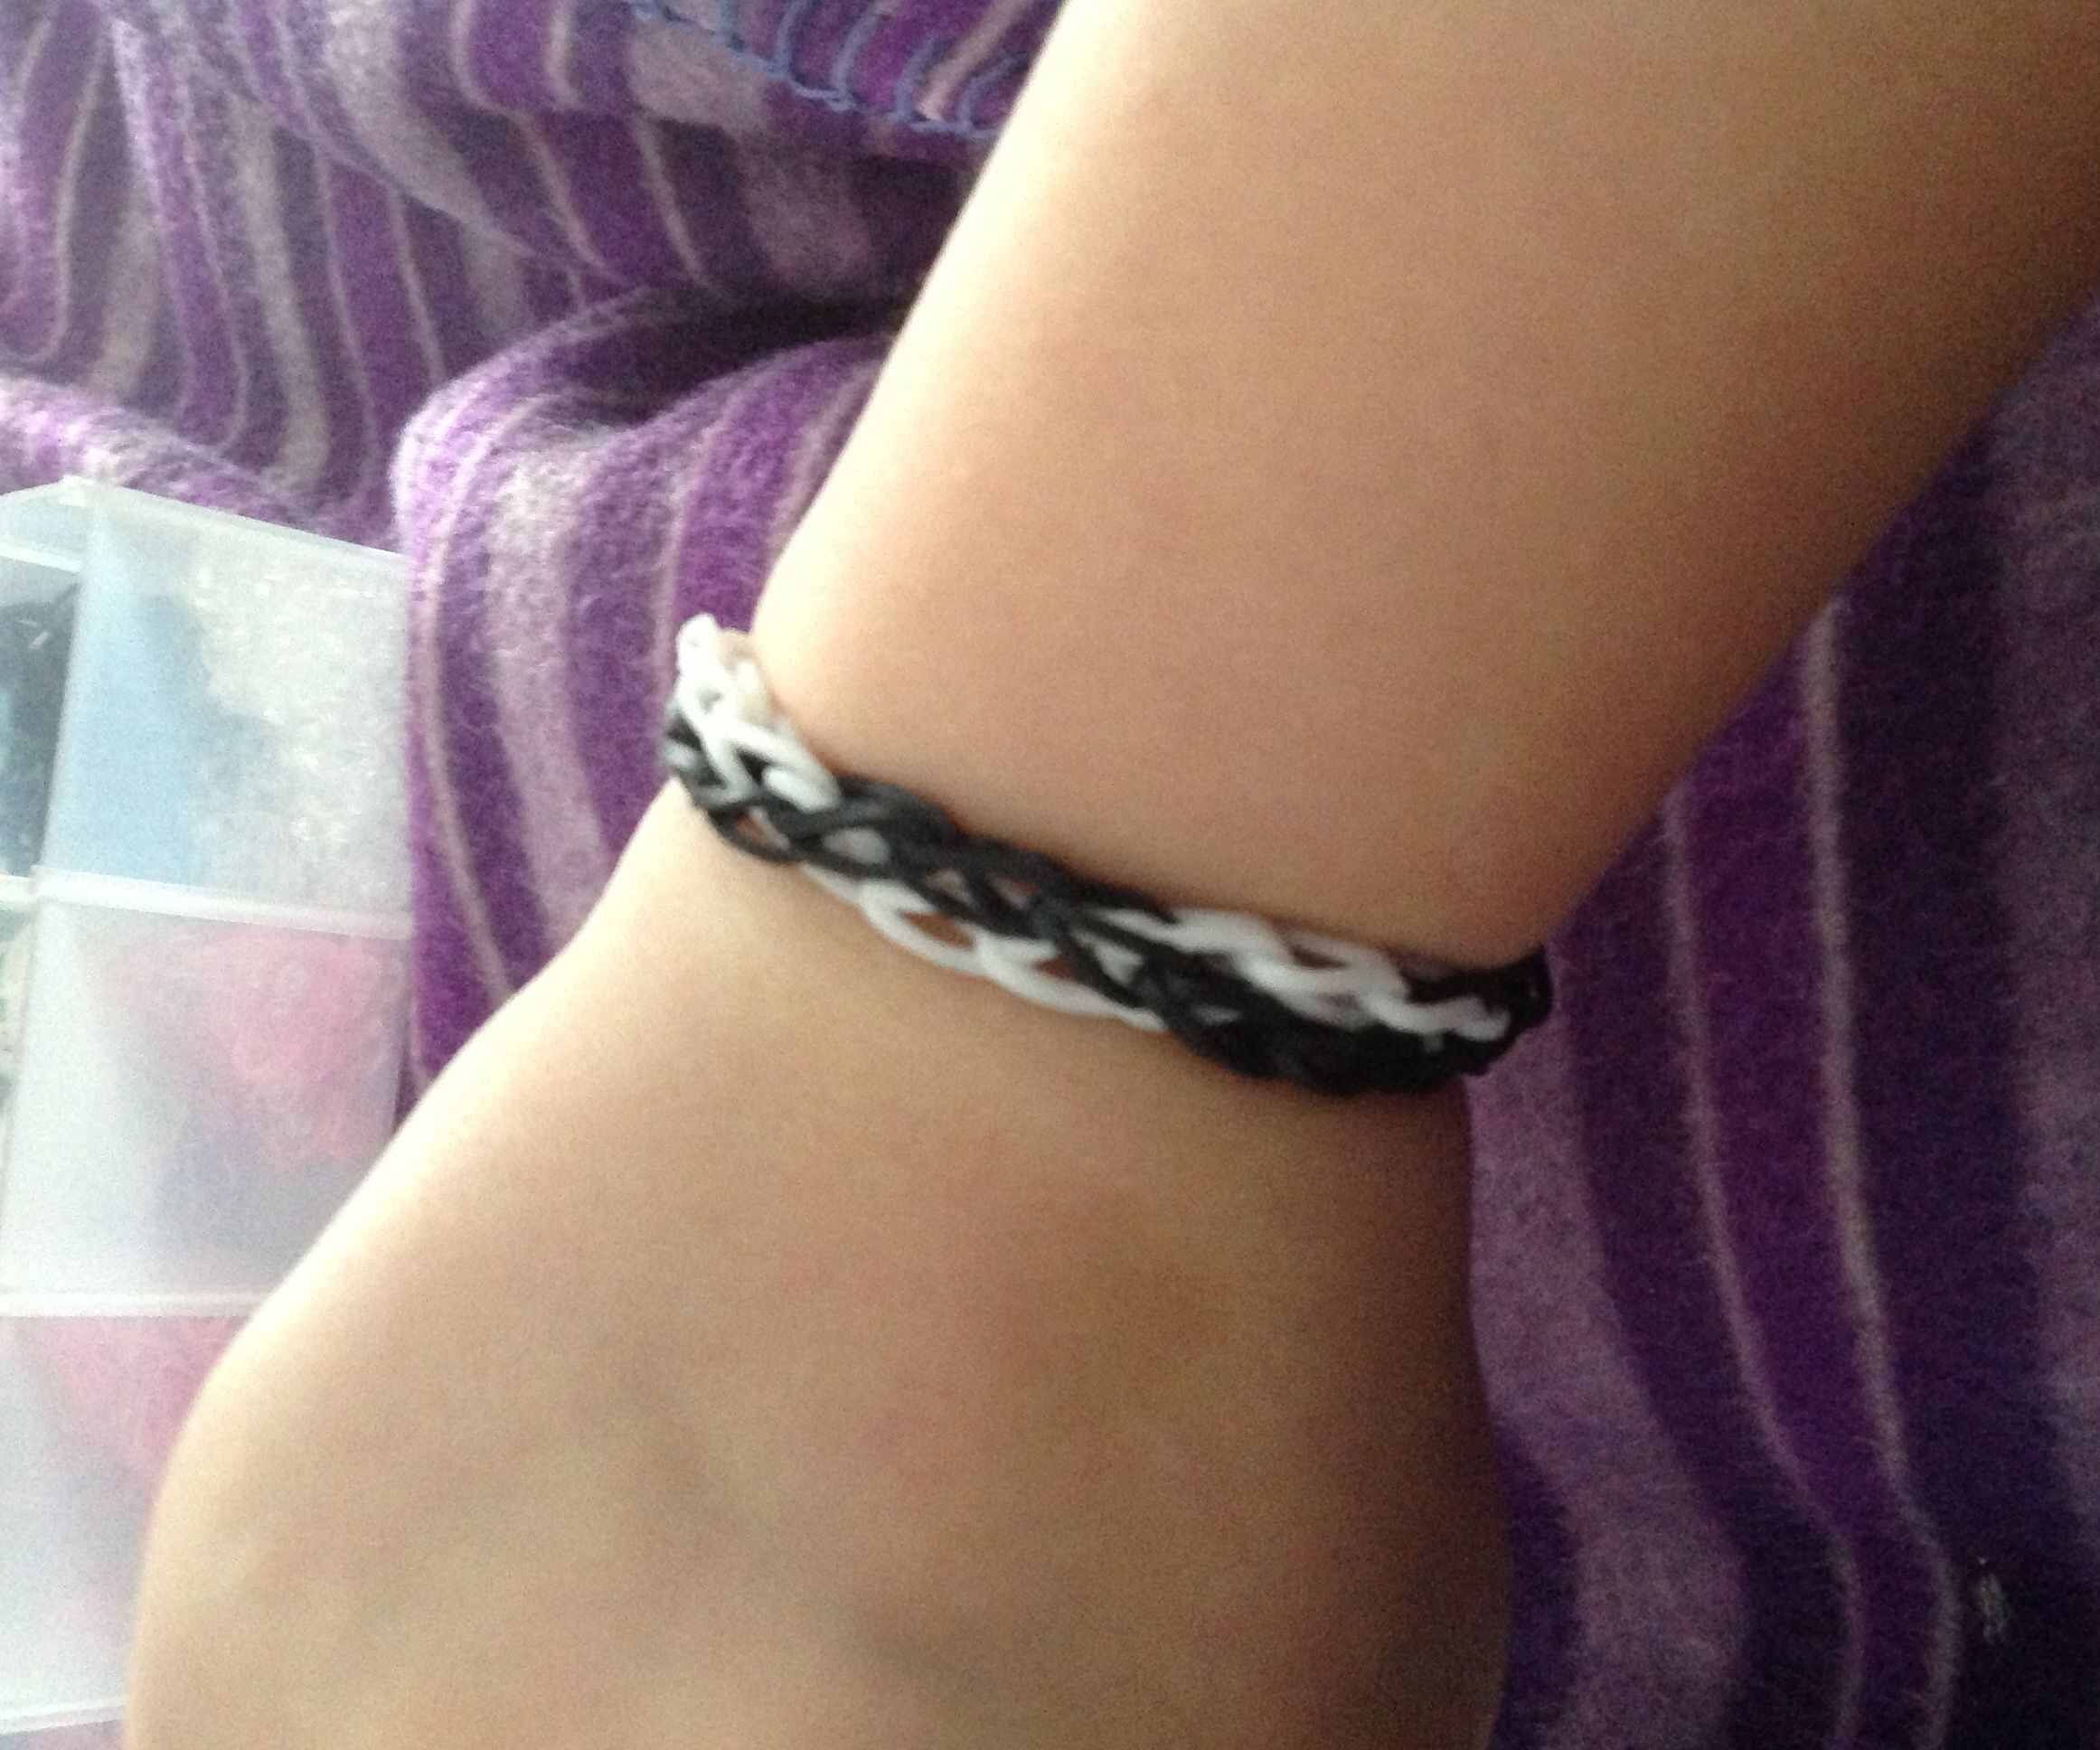 The twist bracelet